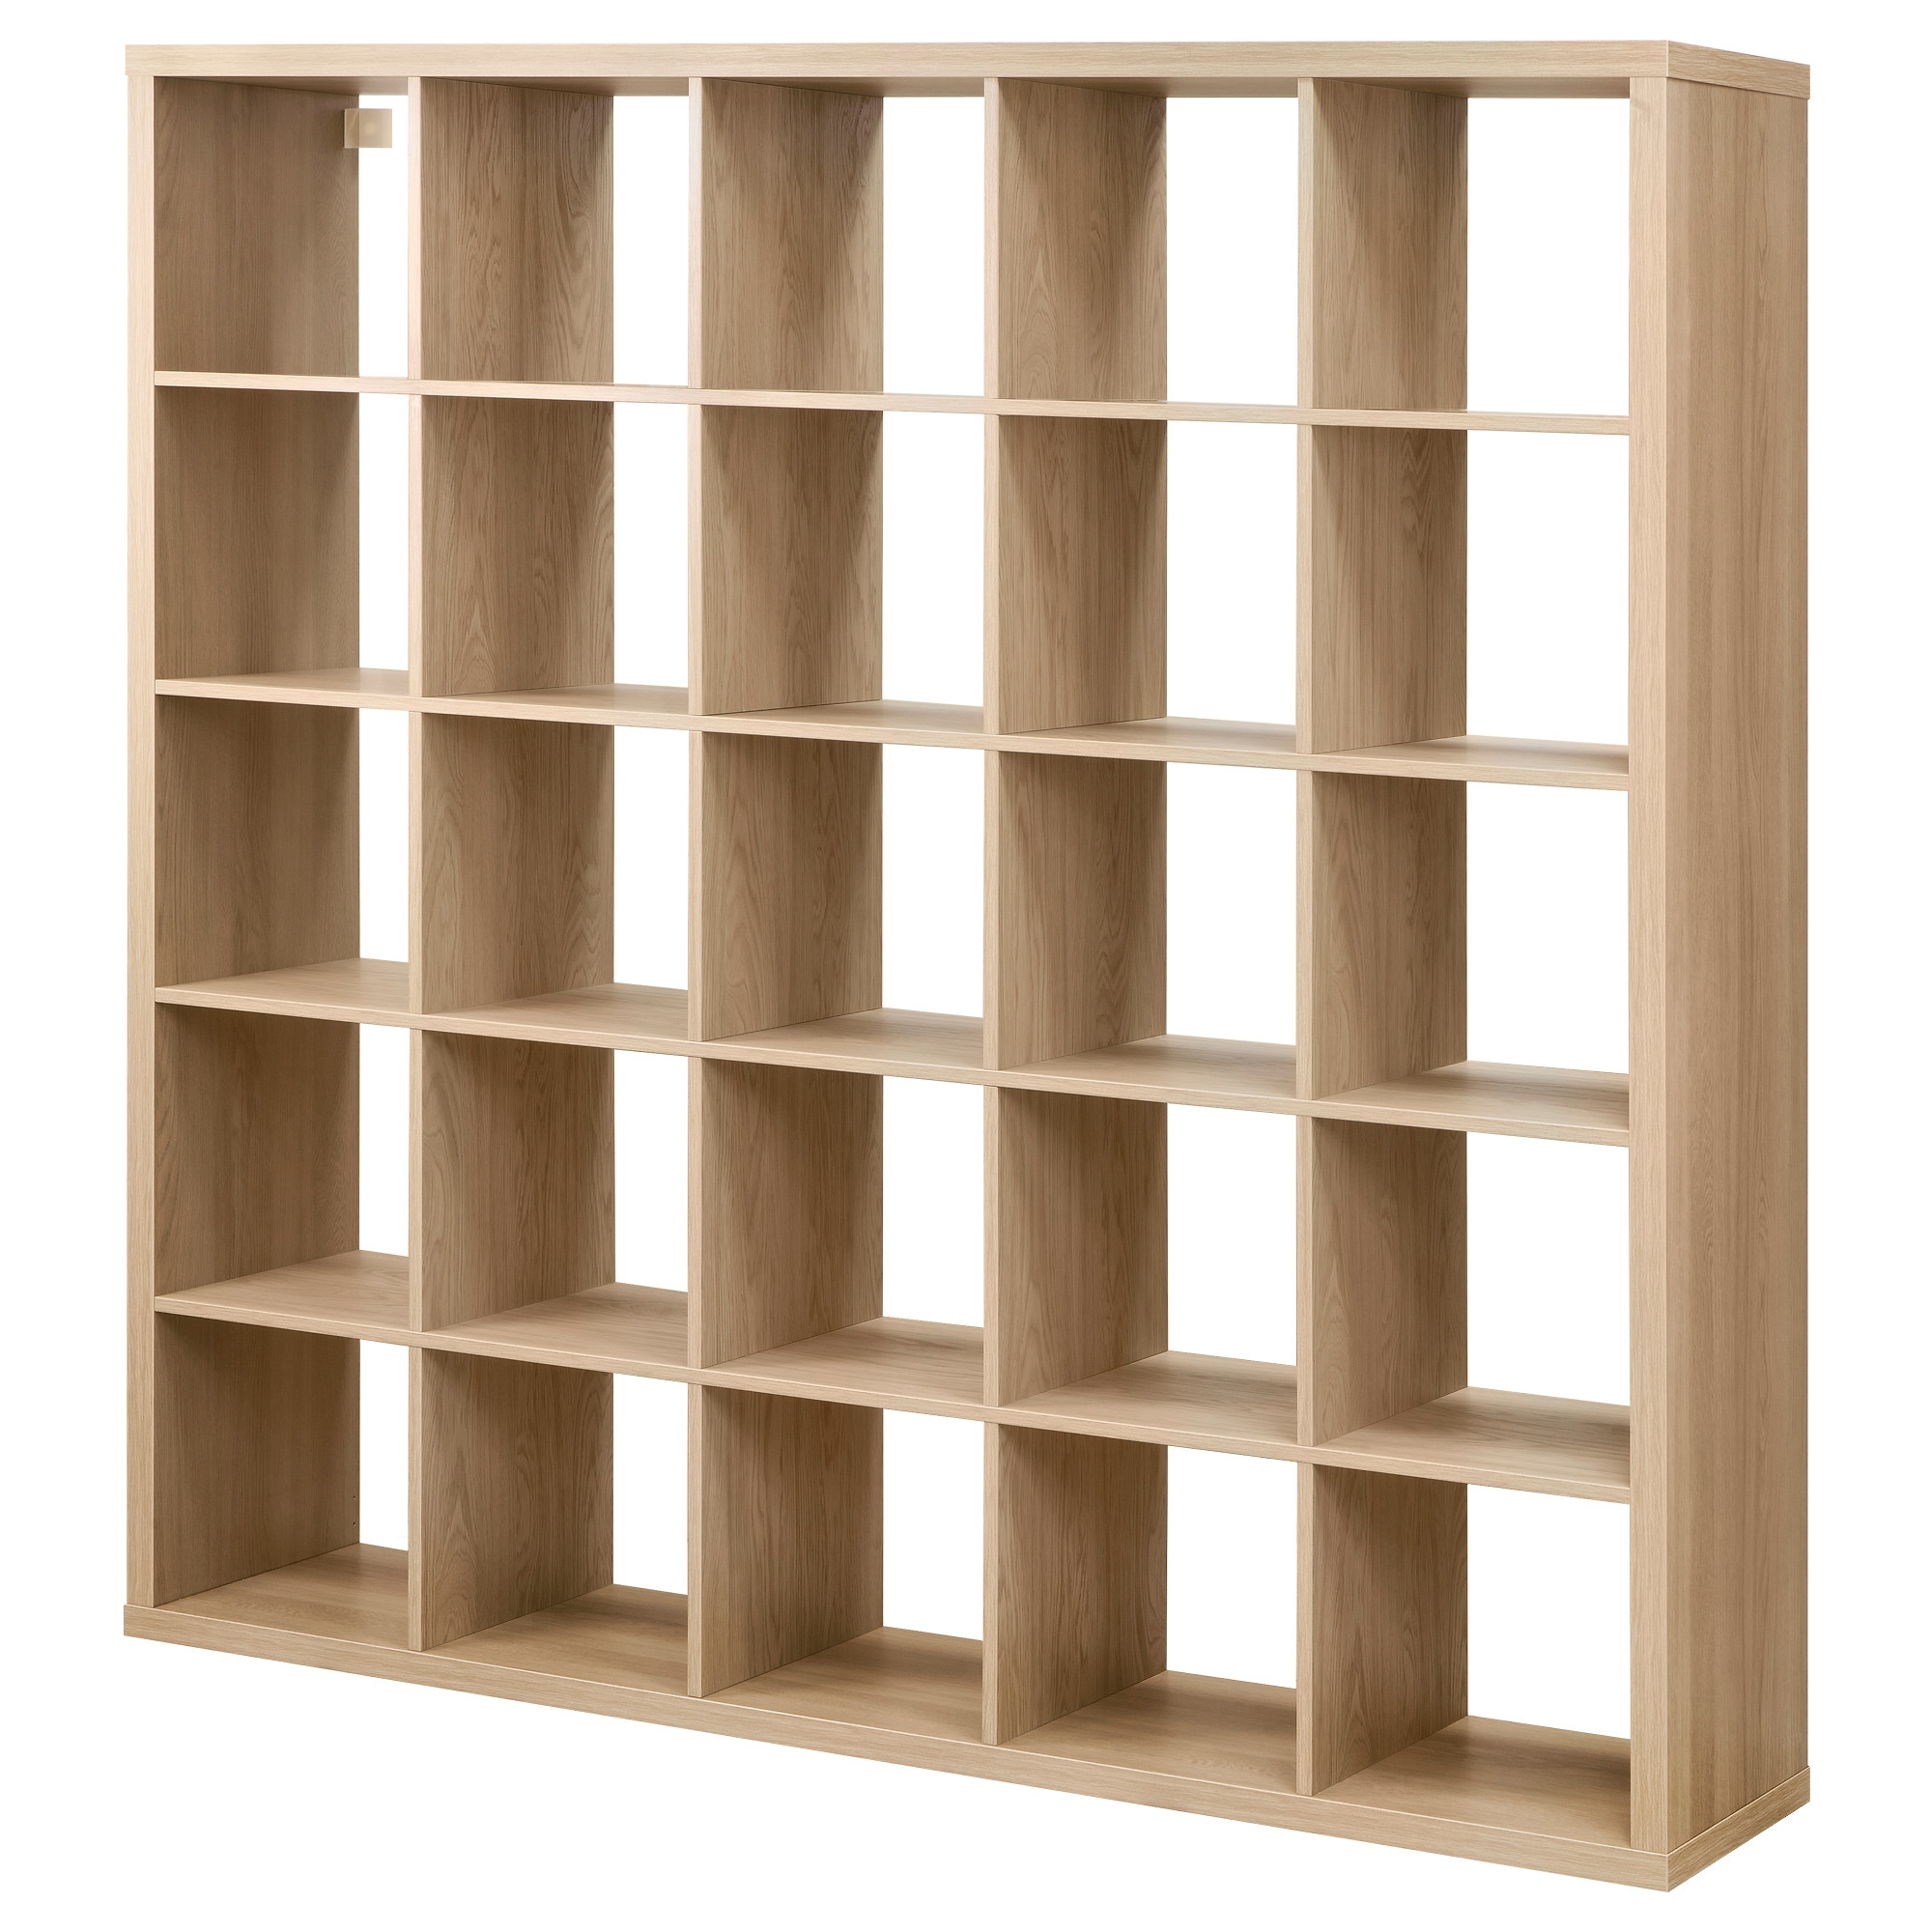 Kallax Shelving Unit Oak Effect 182×182 Cm Ikea Within Storage Shelving Units (#11 of 15)